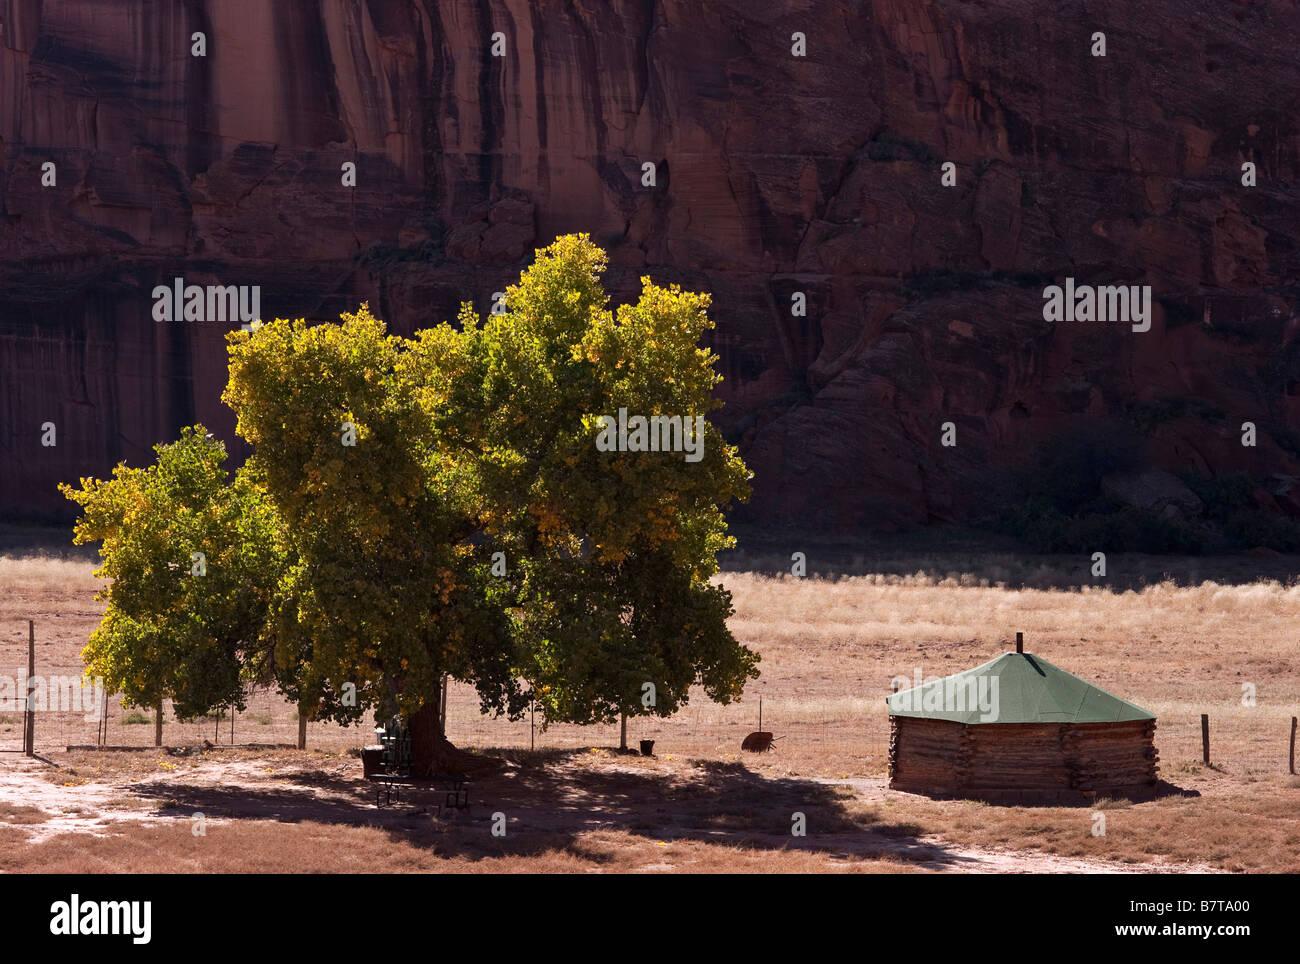 Navajo hogan Canyon de Chelly National Monument Arizona USA - Stock Image